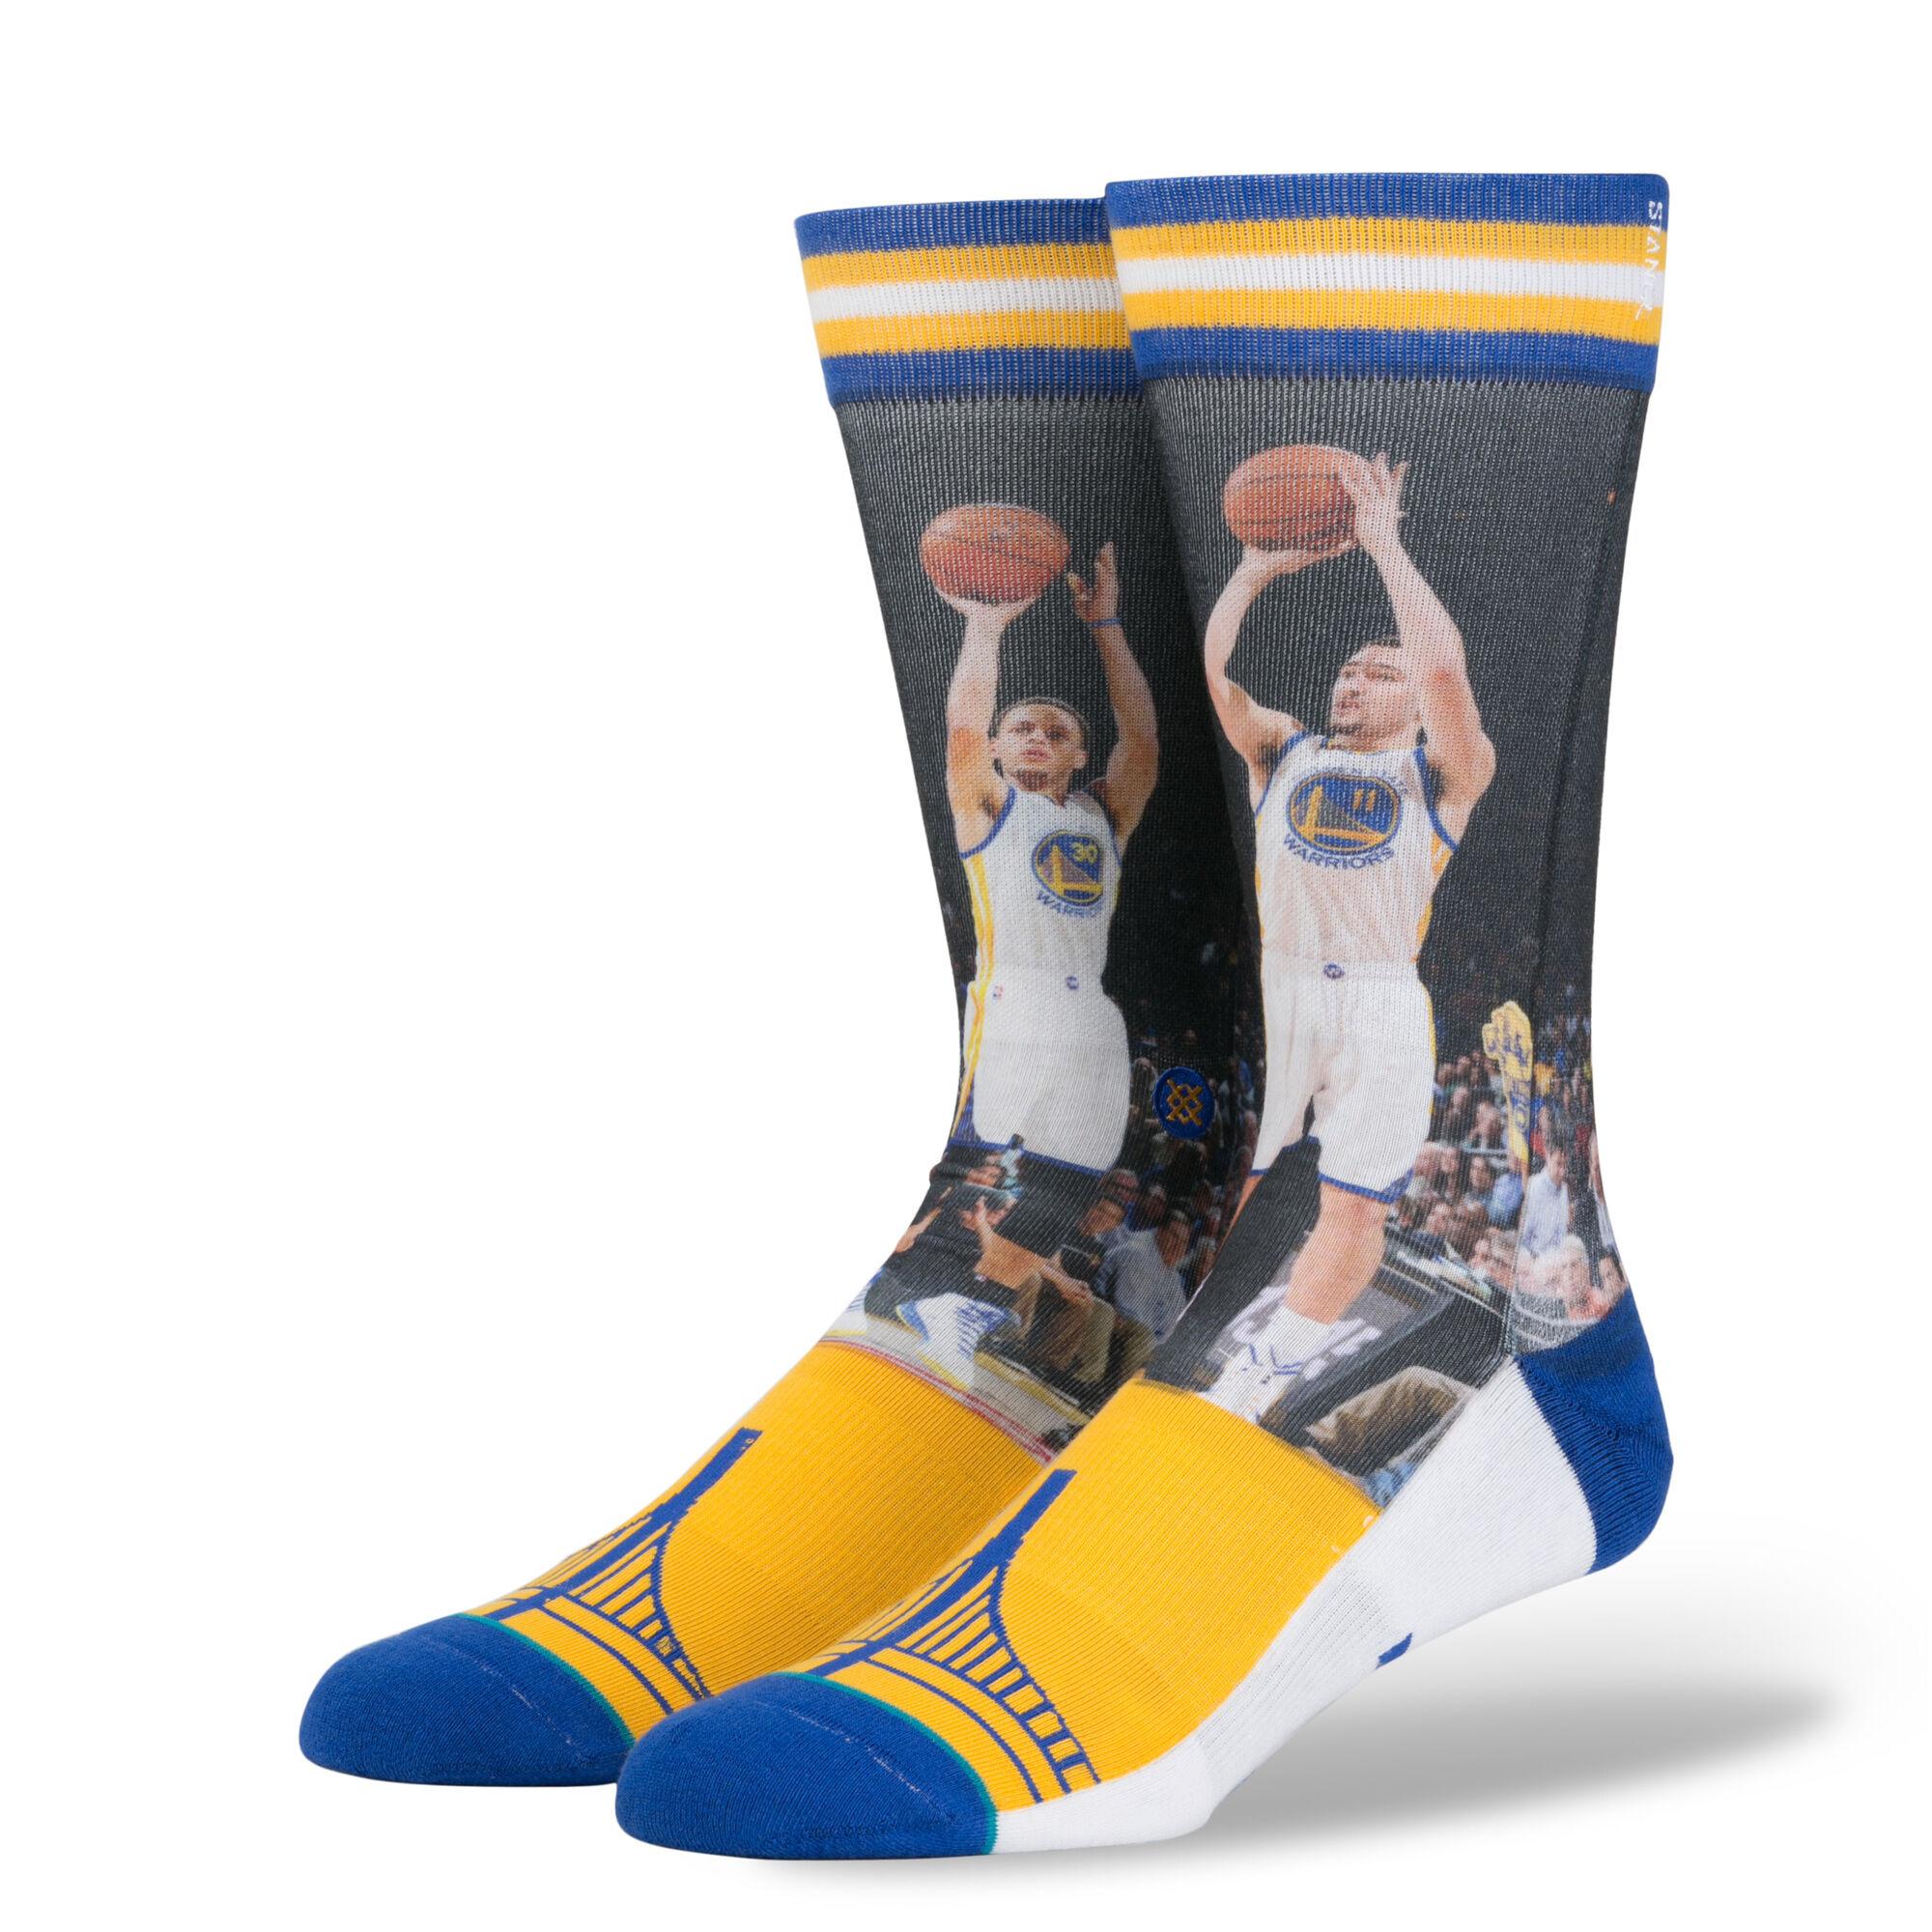 Curry / Thompson - Mens NBA Future Legends Socks   Stance